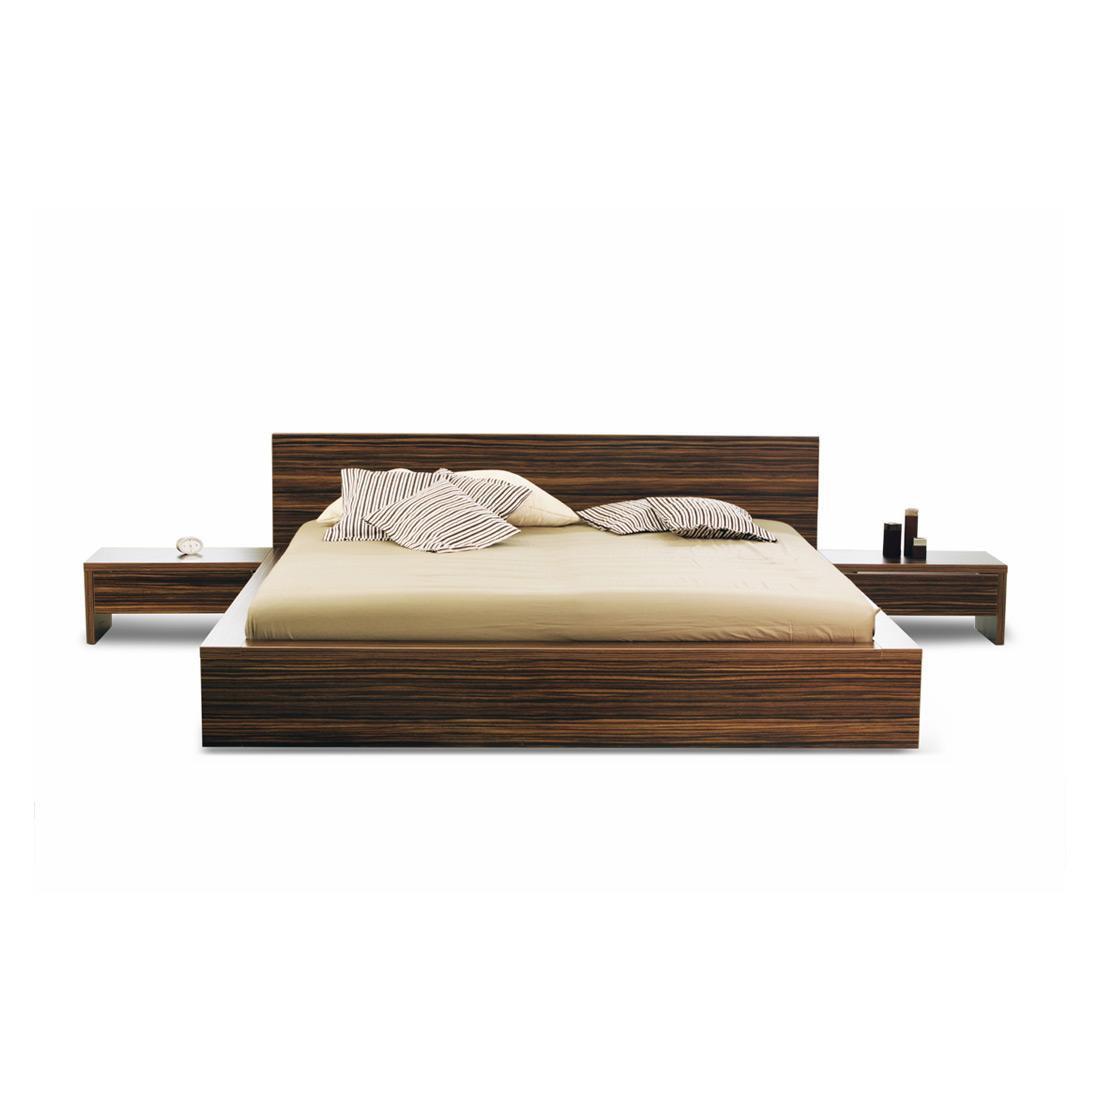 Dark Wood Bed 50lbs